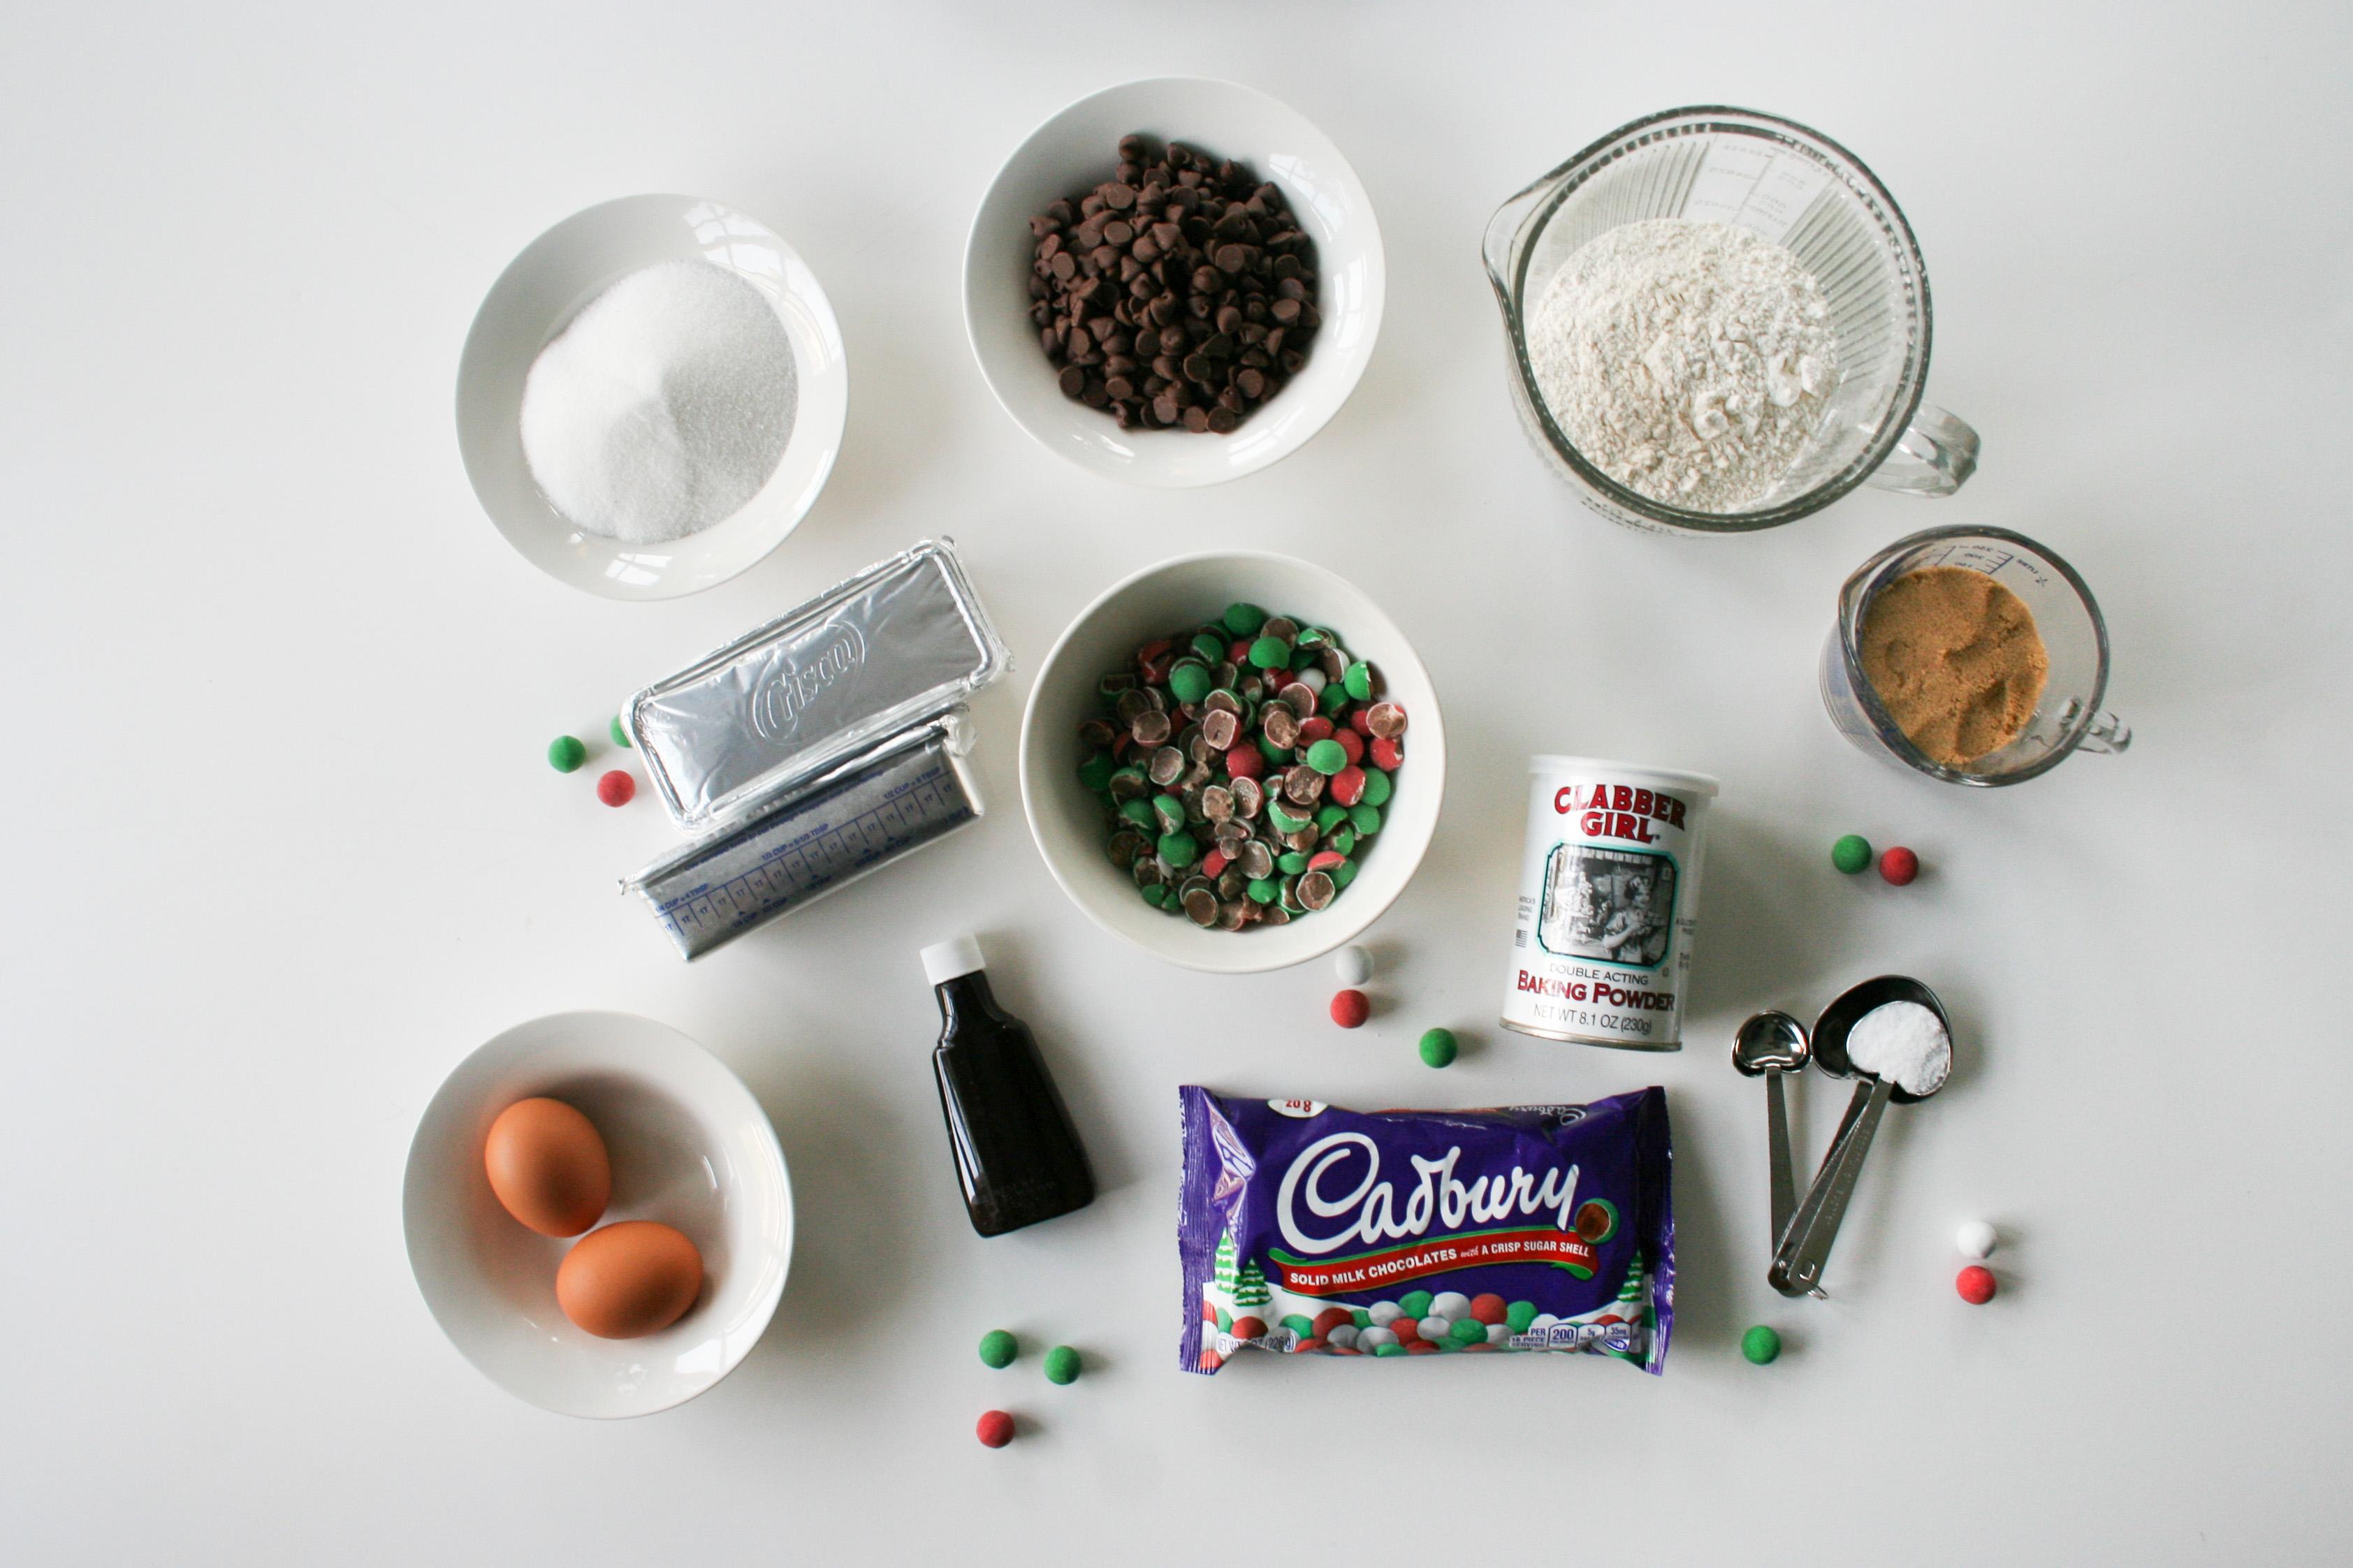 Cadbury Christmas Balls Chocolate Chip Cookies - Salty Canary